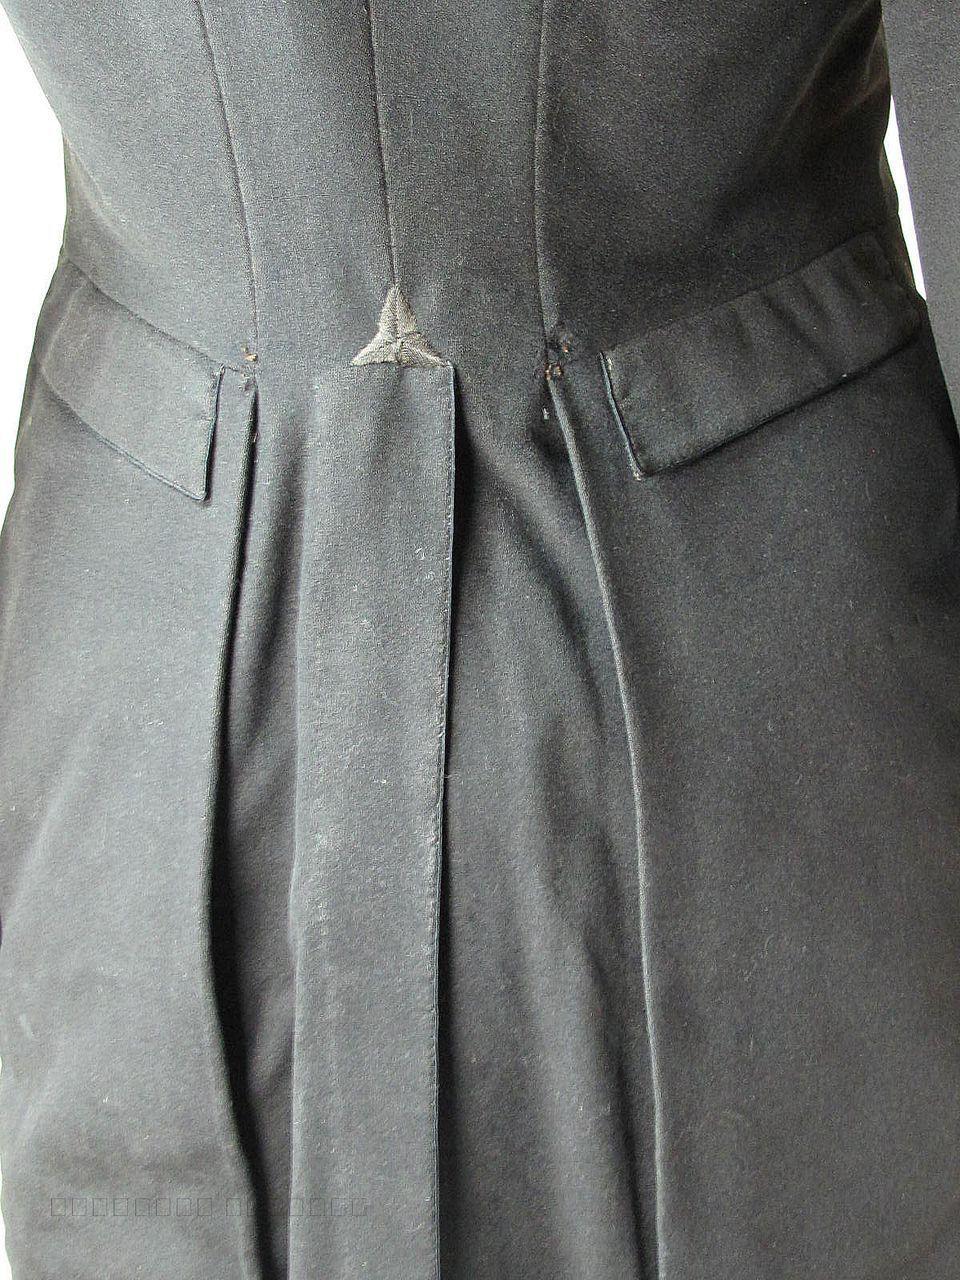 Rare Mens Circa 1810 Regency Wool Suit Fall Front